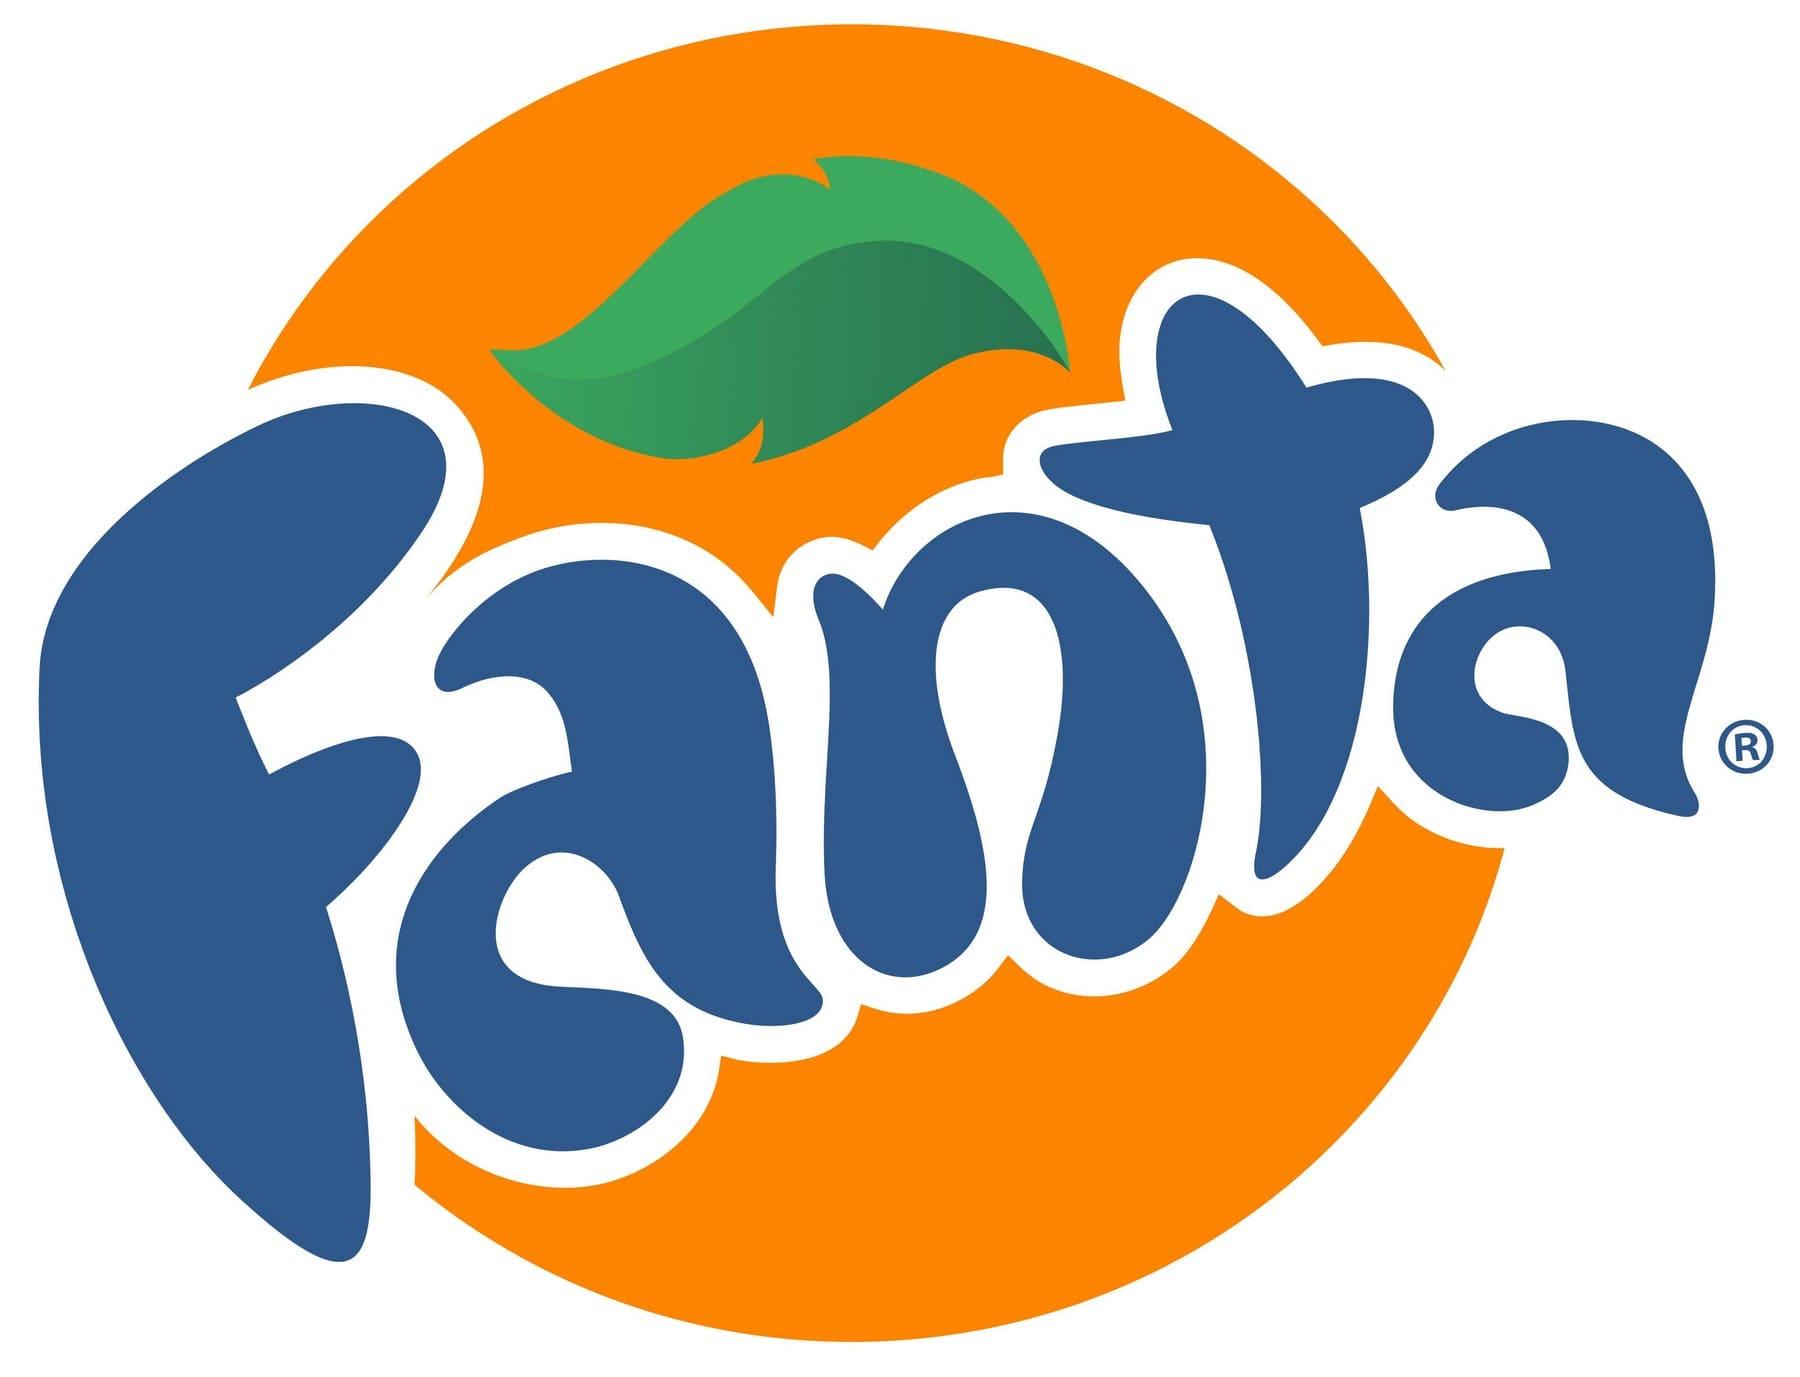 fanta-logo